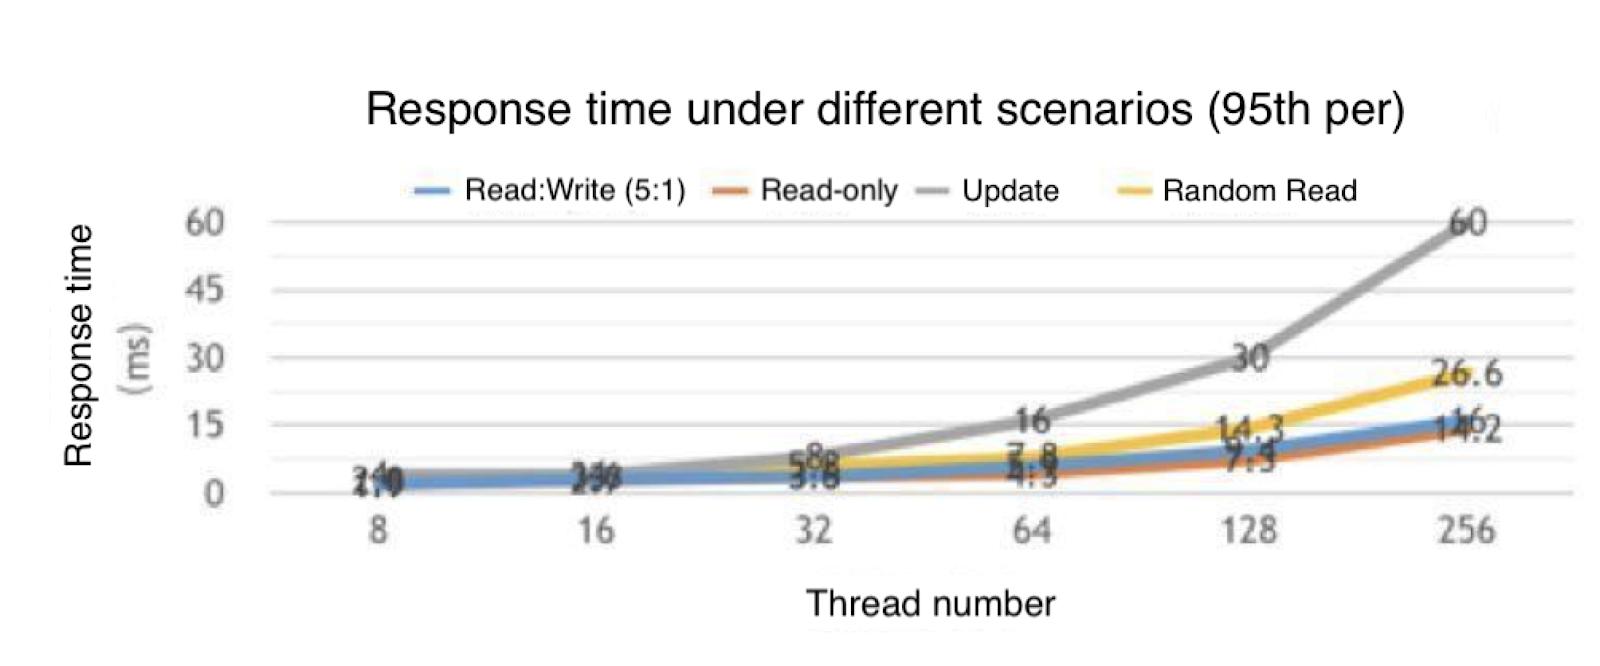 Response time under different scenarios